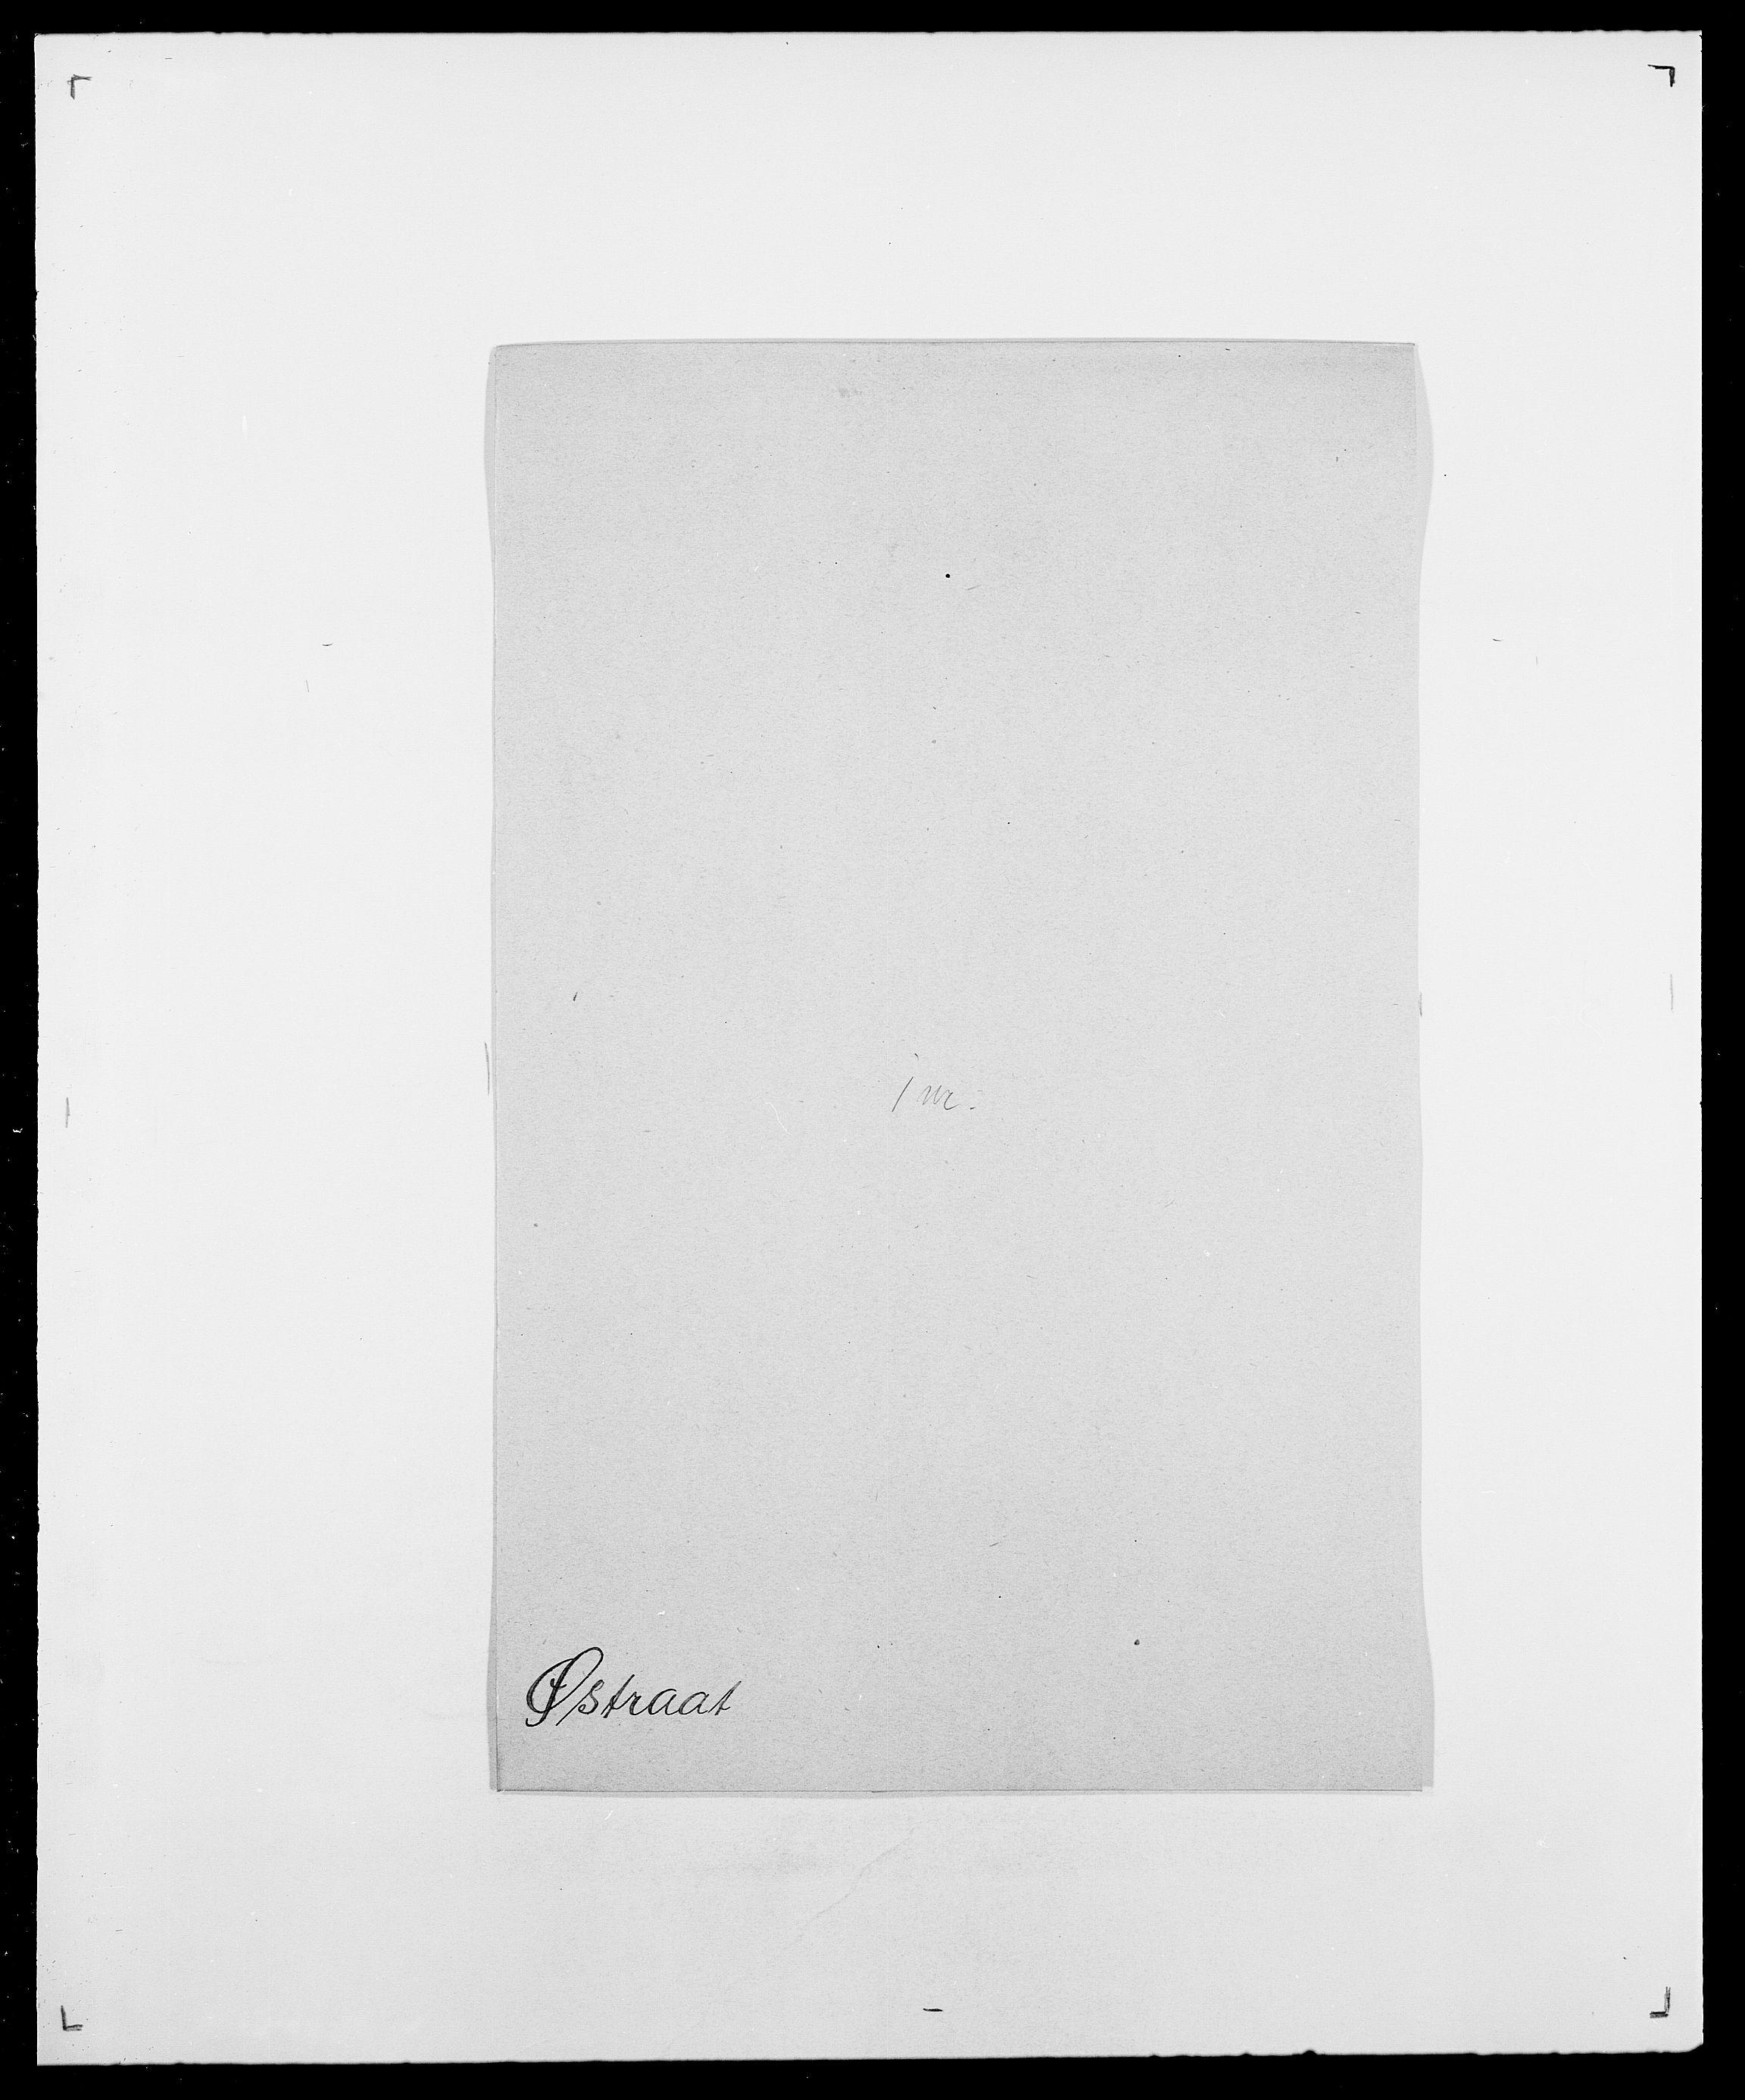 SAO, Delgobe, Charles Antoine - samling, D/Da/L0043: Wulfsberg - v. Zanten, s. 363